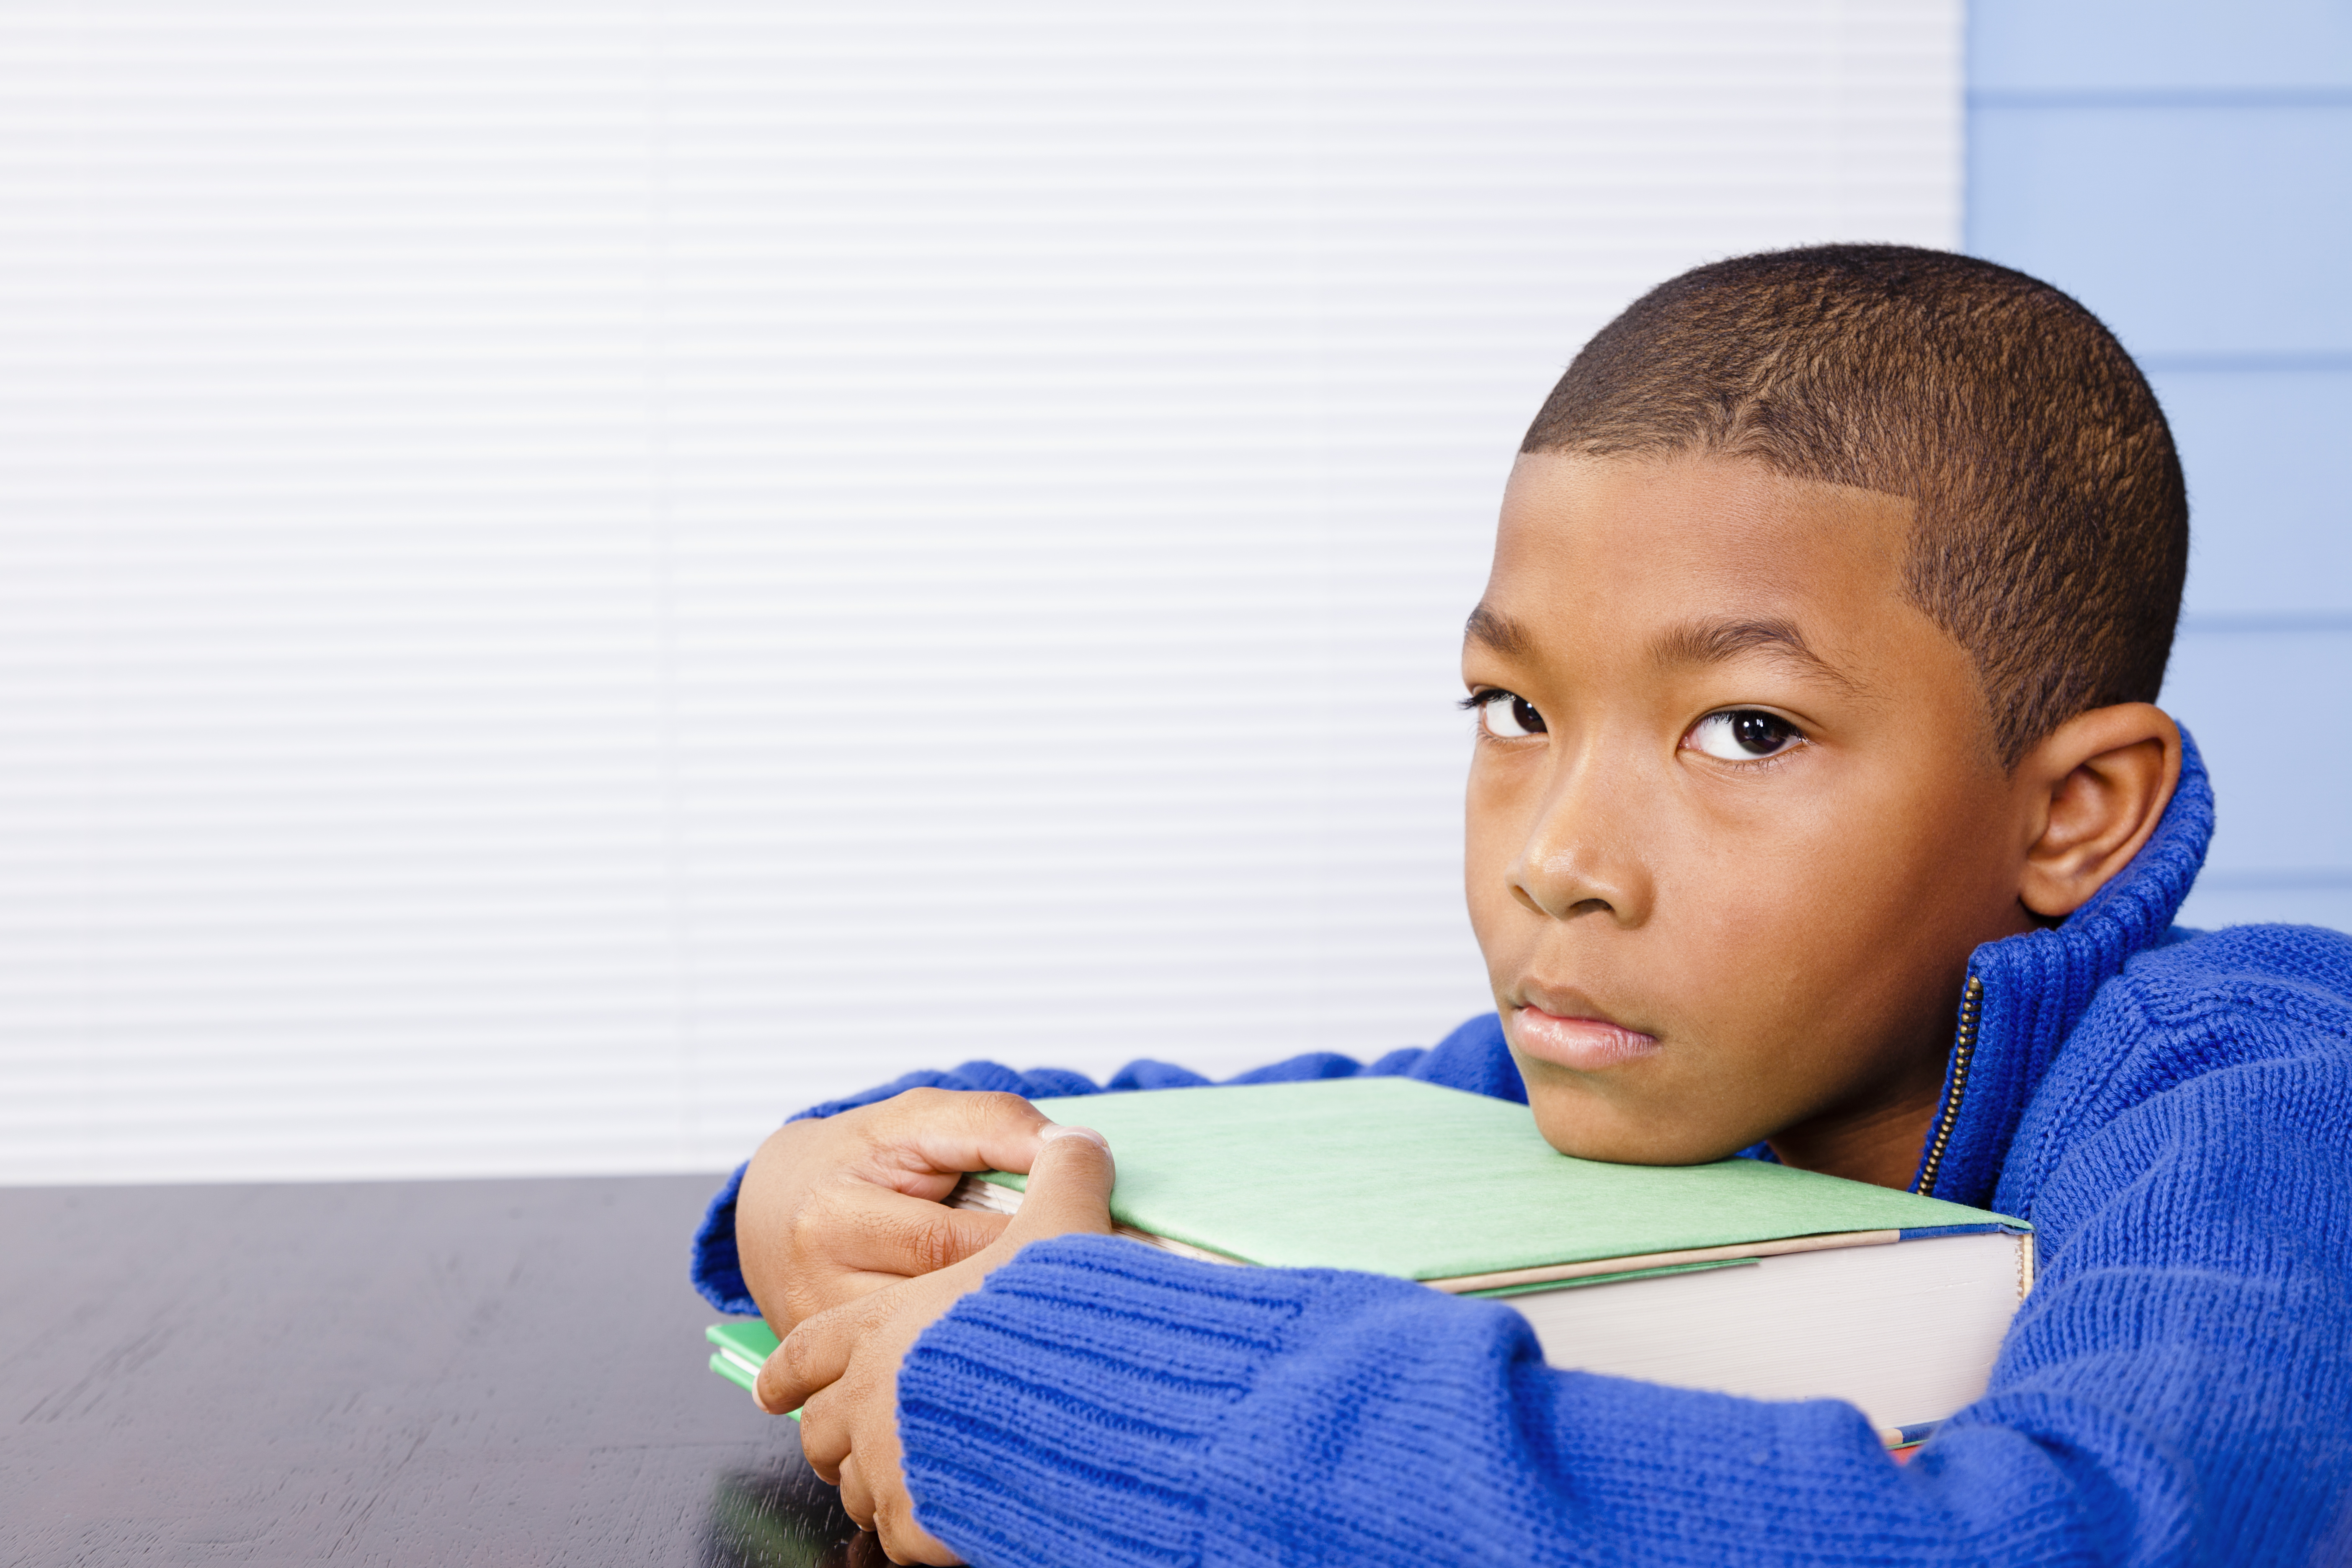 Young elementary aged boy procrastinating homework or depressed